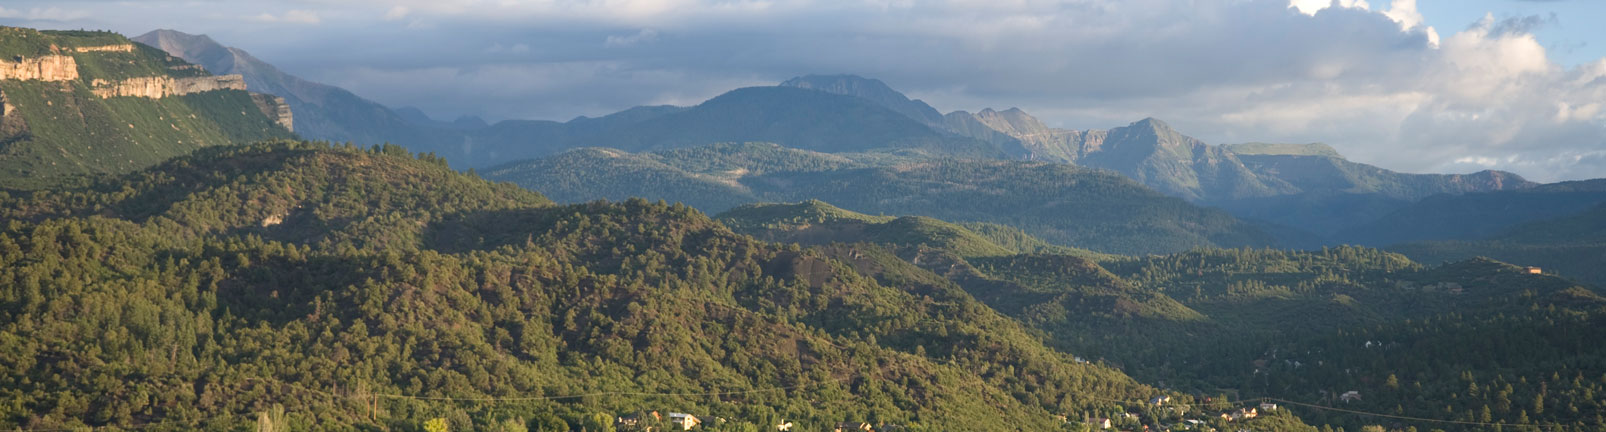 southwest colorado mountains